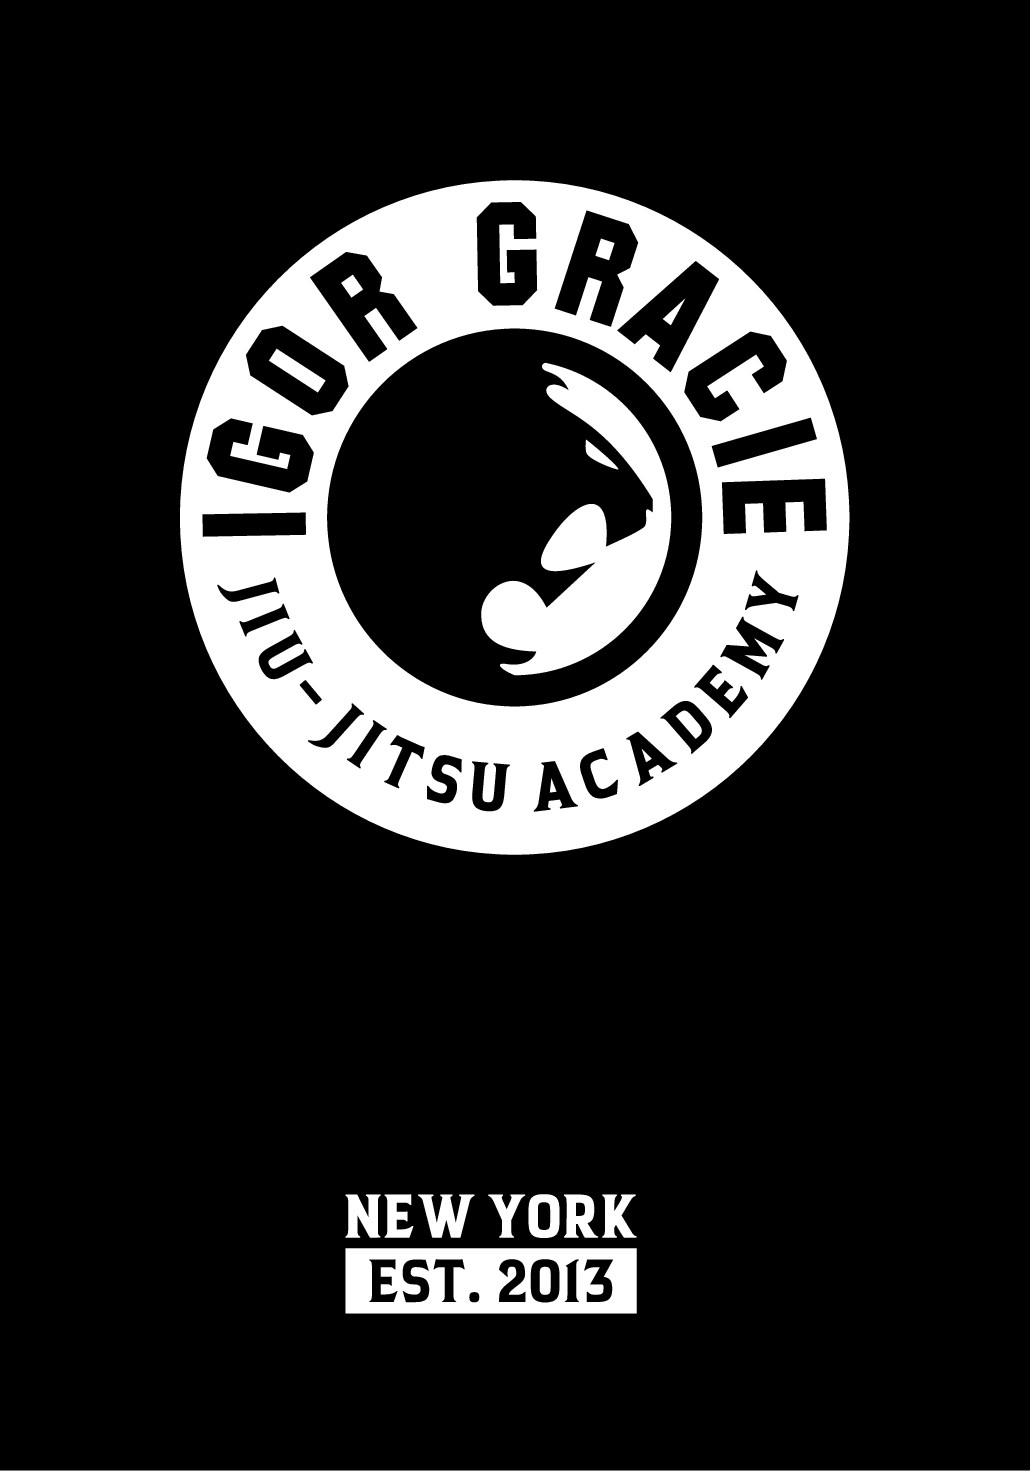 Jiu-Jitsu Academy t-shirt